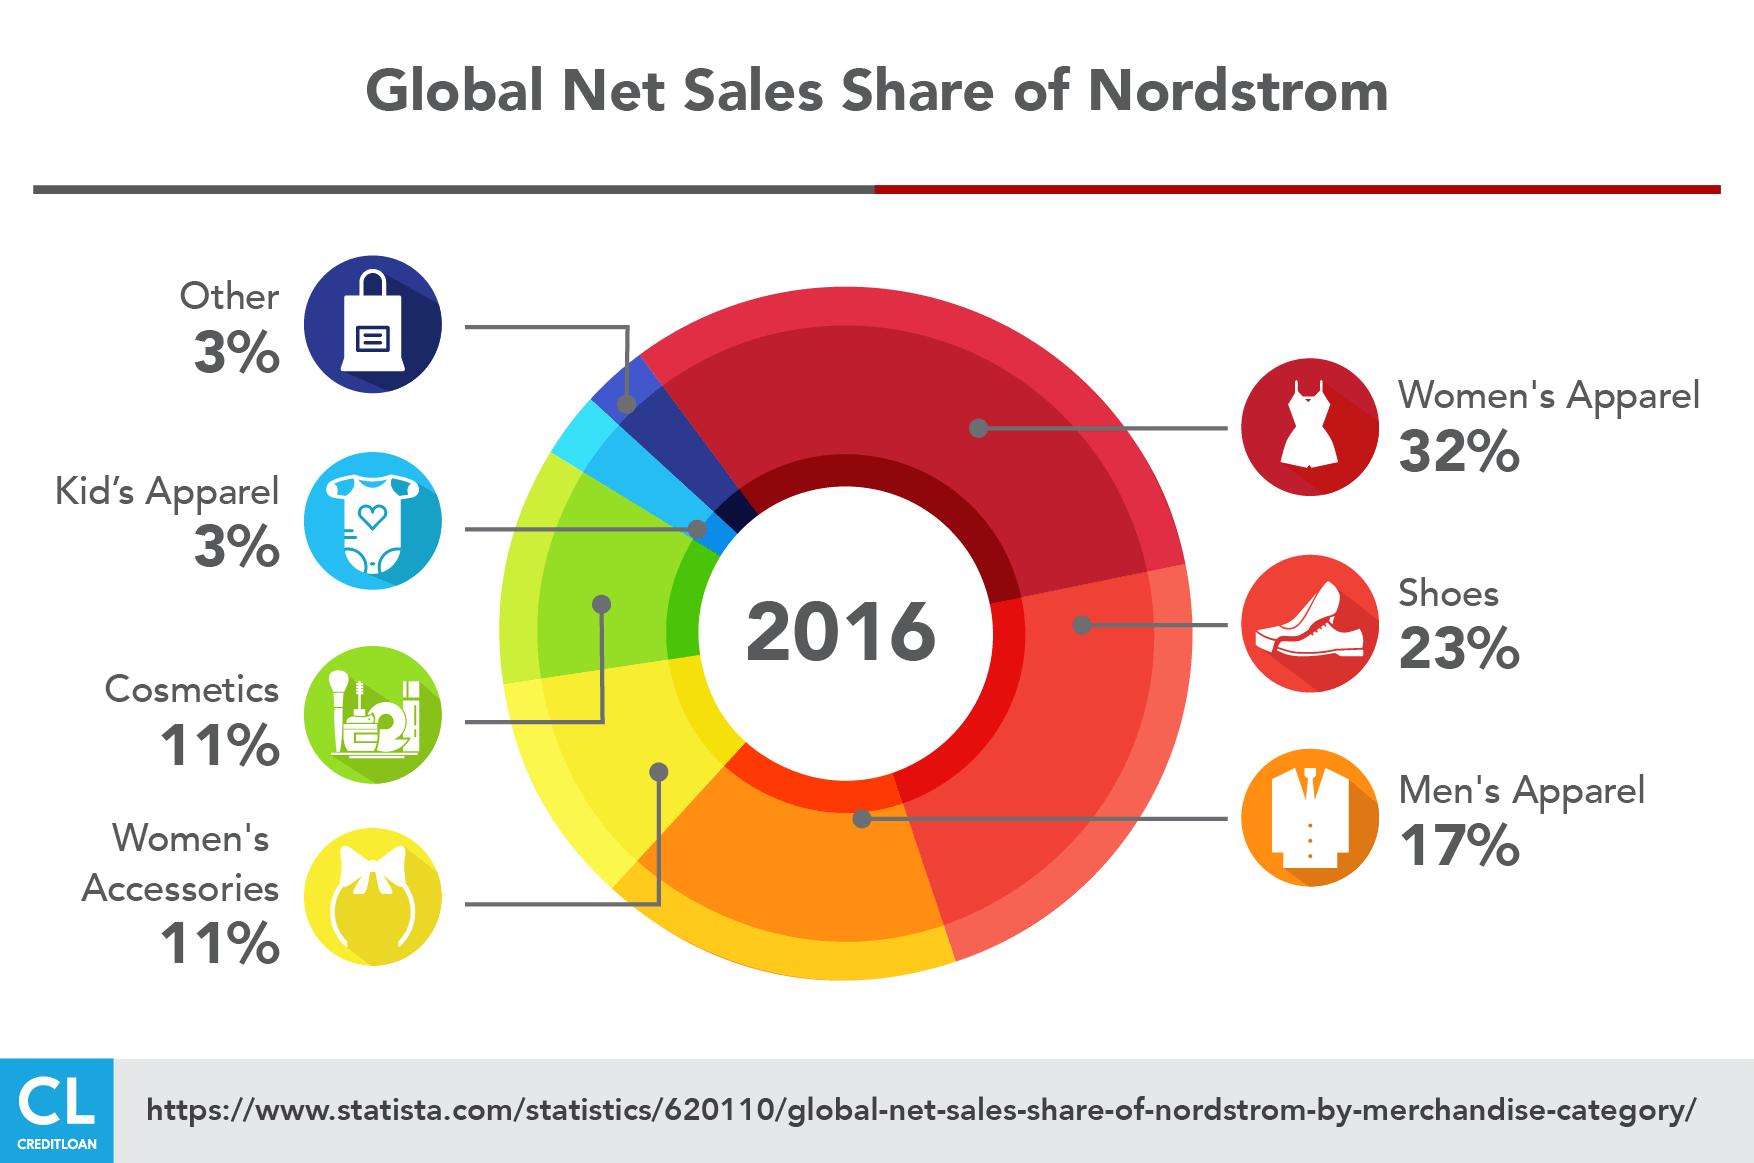 Global Net Sales Share of Nordstrom